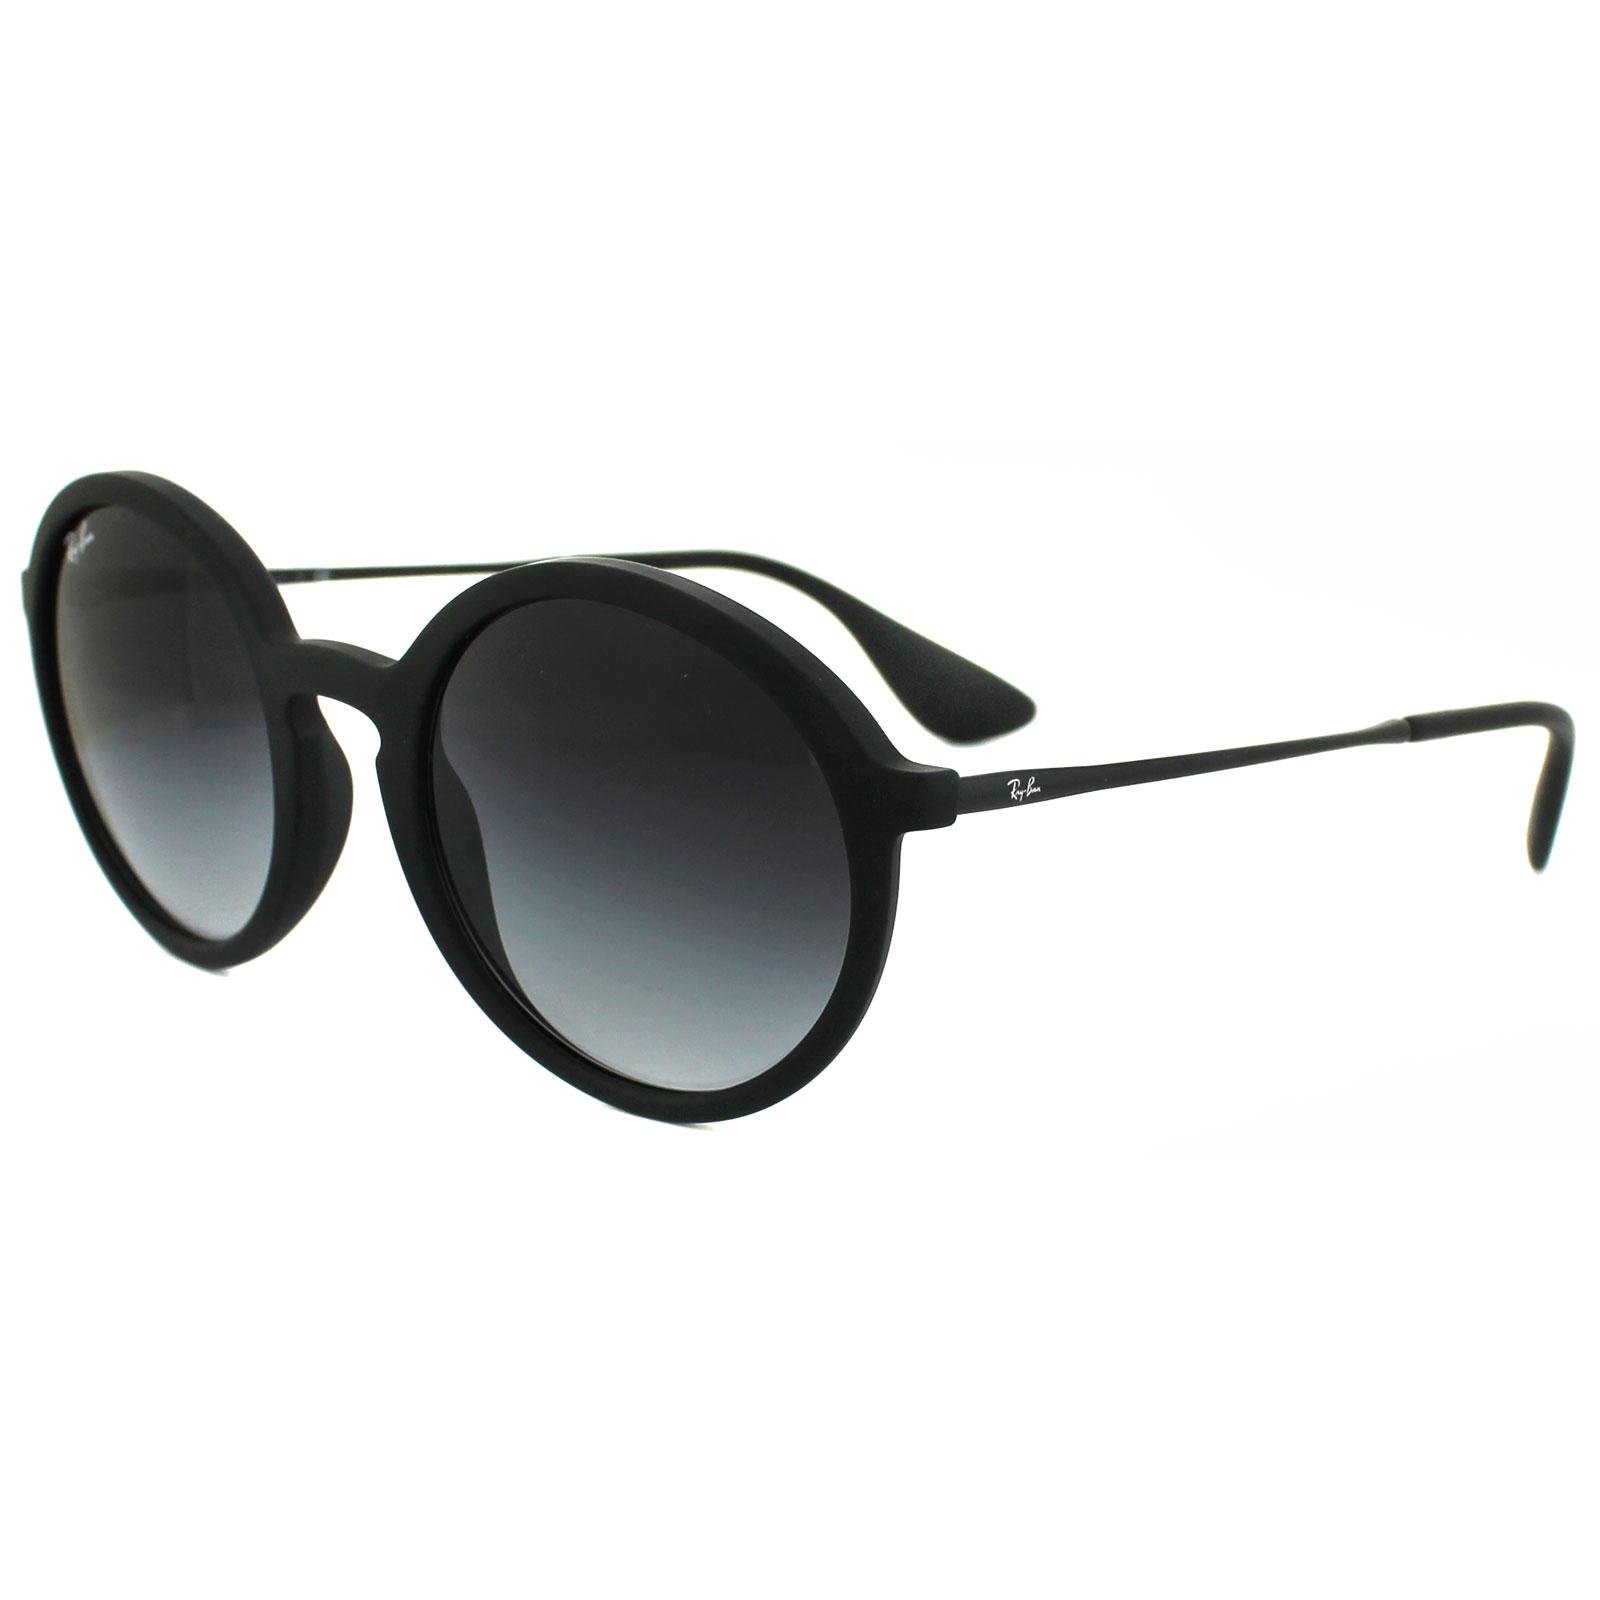 de679788acf Sentinel Ray-Ban Sunglasses 4222 622 8G Black Rubber Grey Gradient